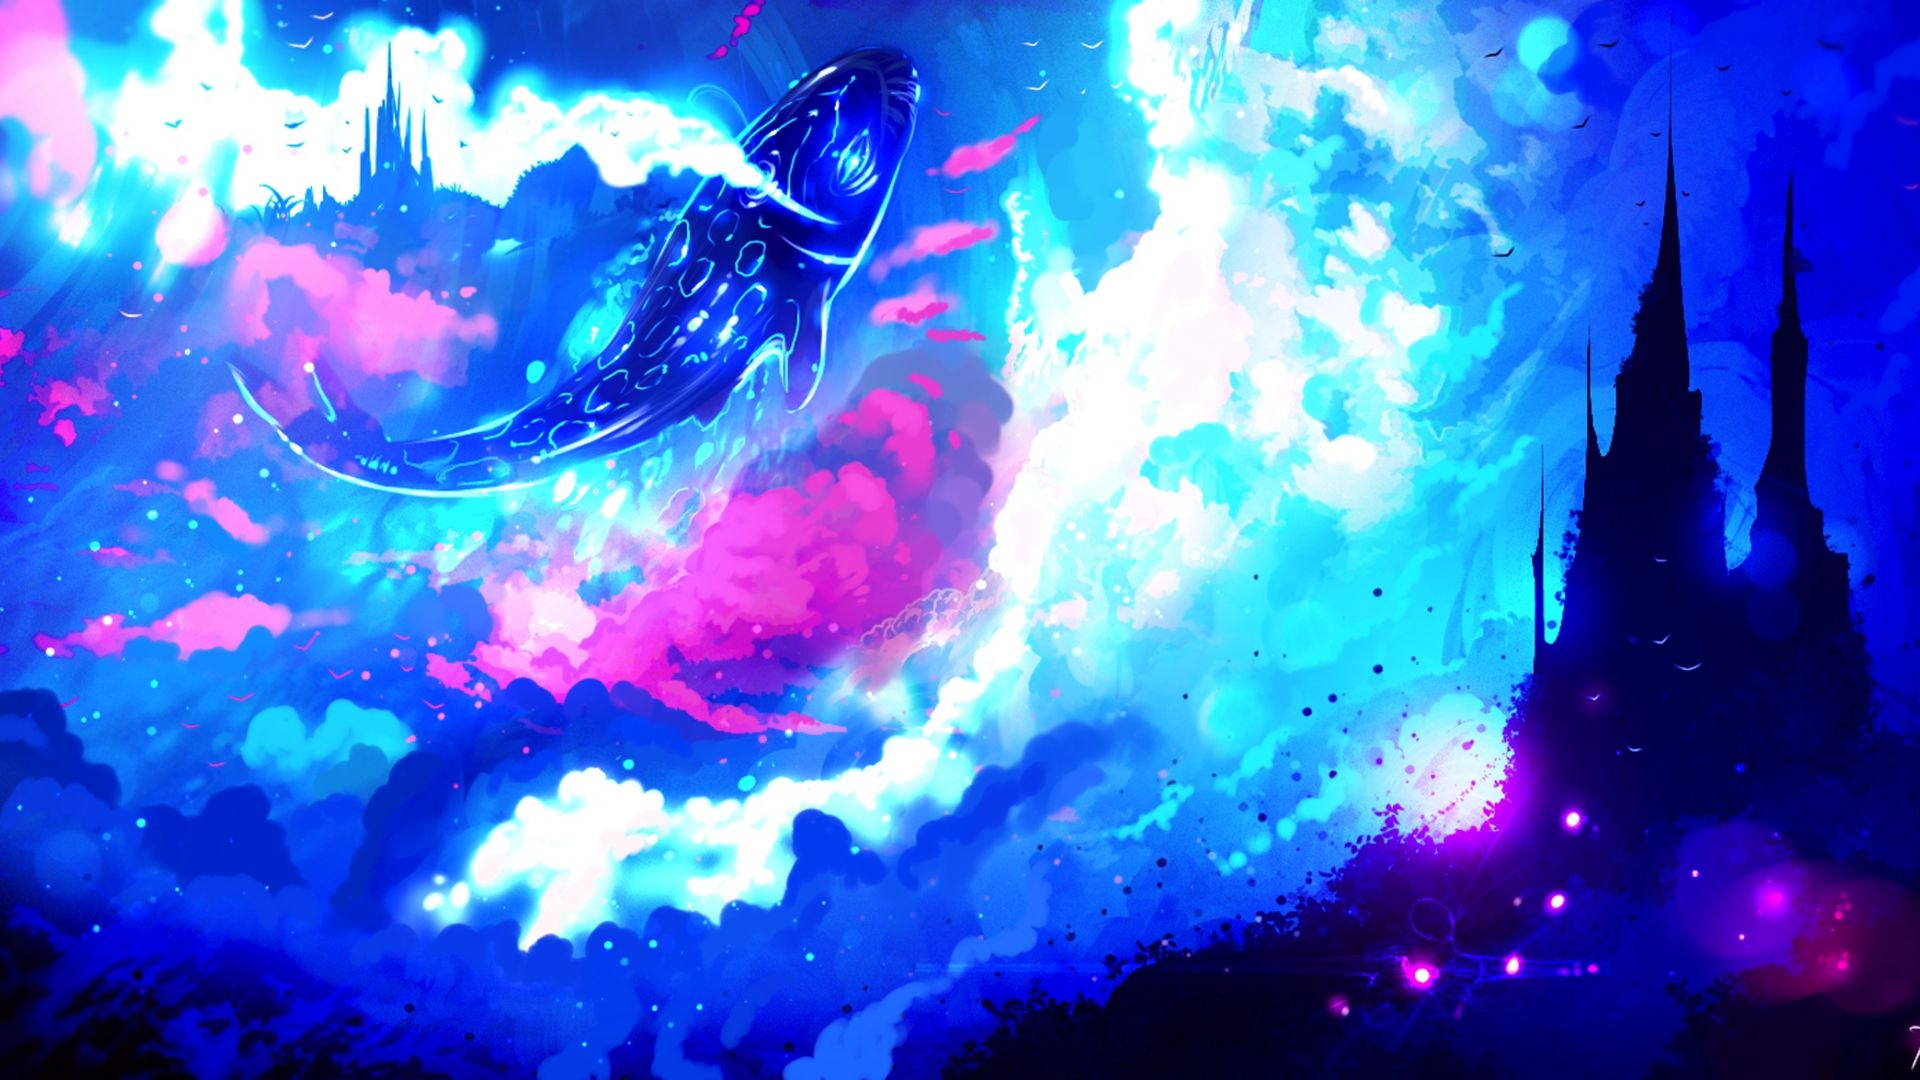 Wallpaper Castle, fish, fantasy, original, anime art